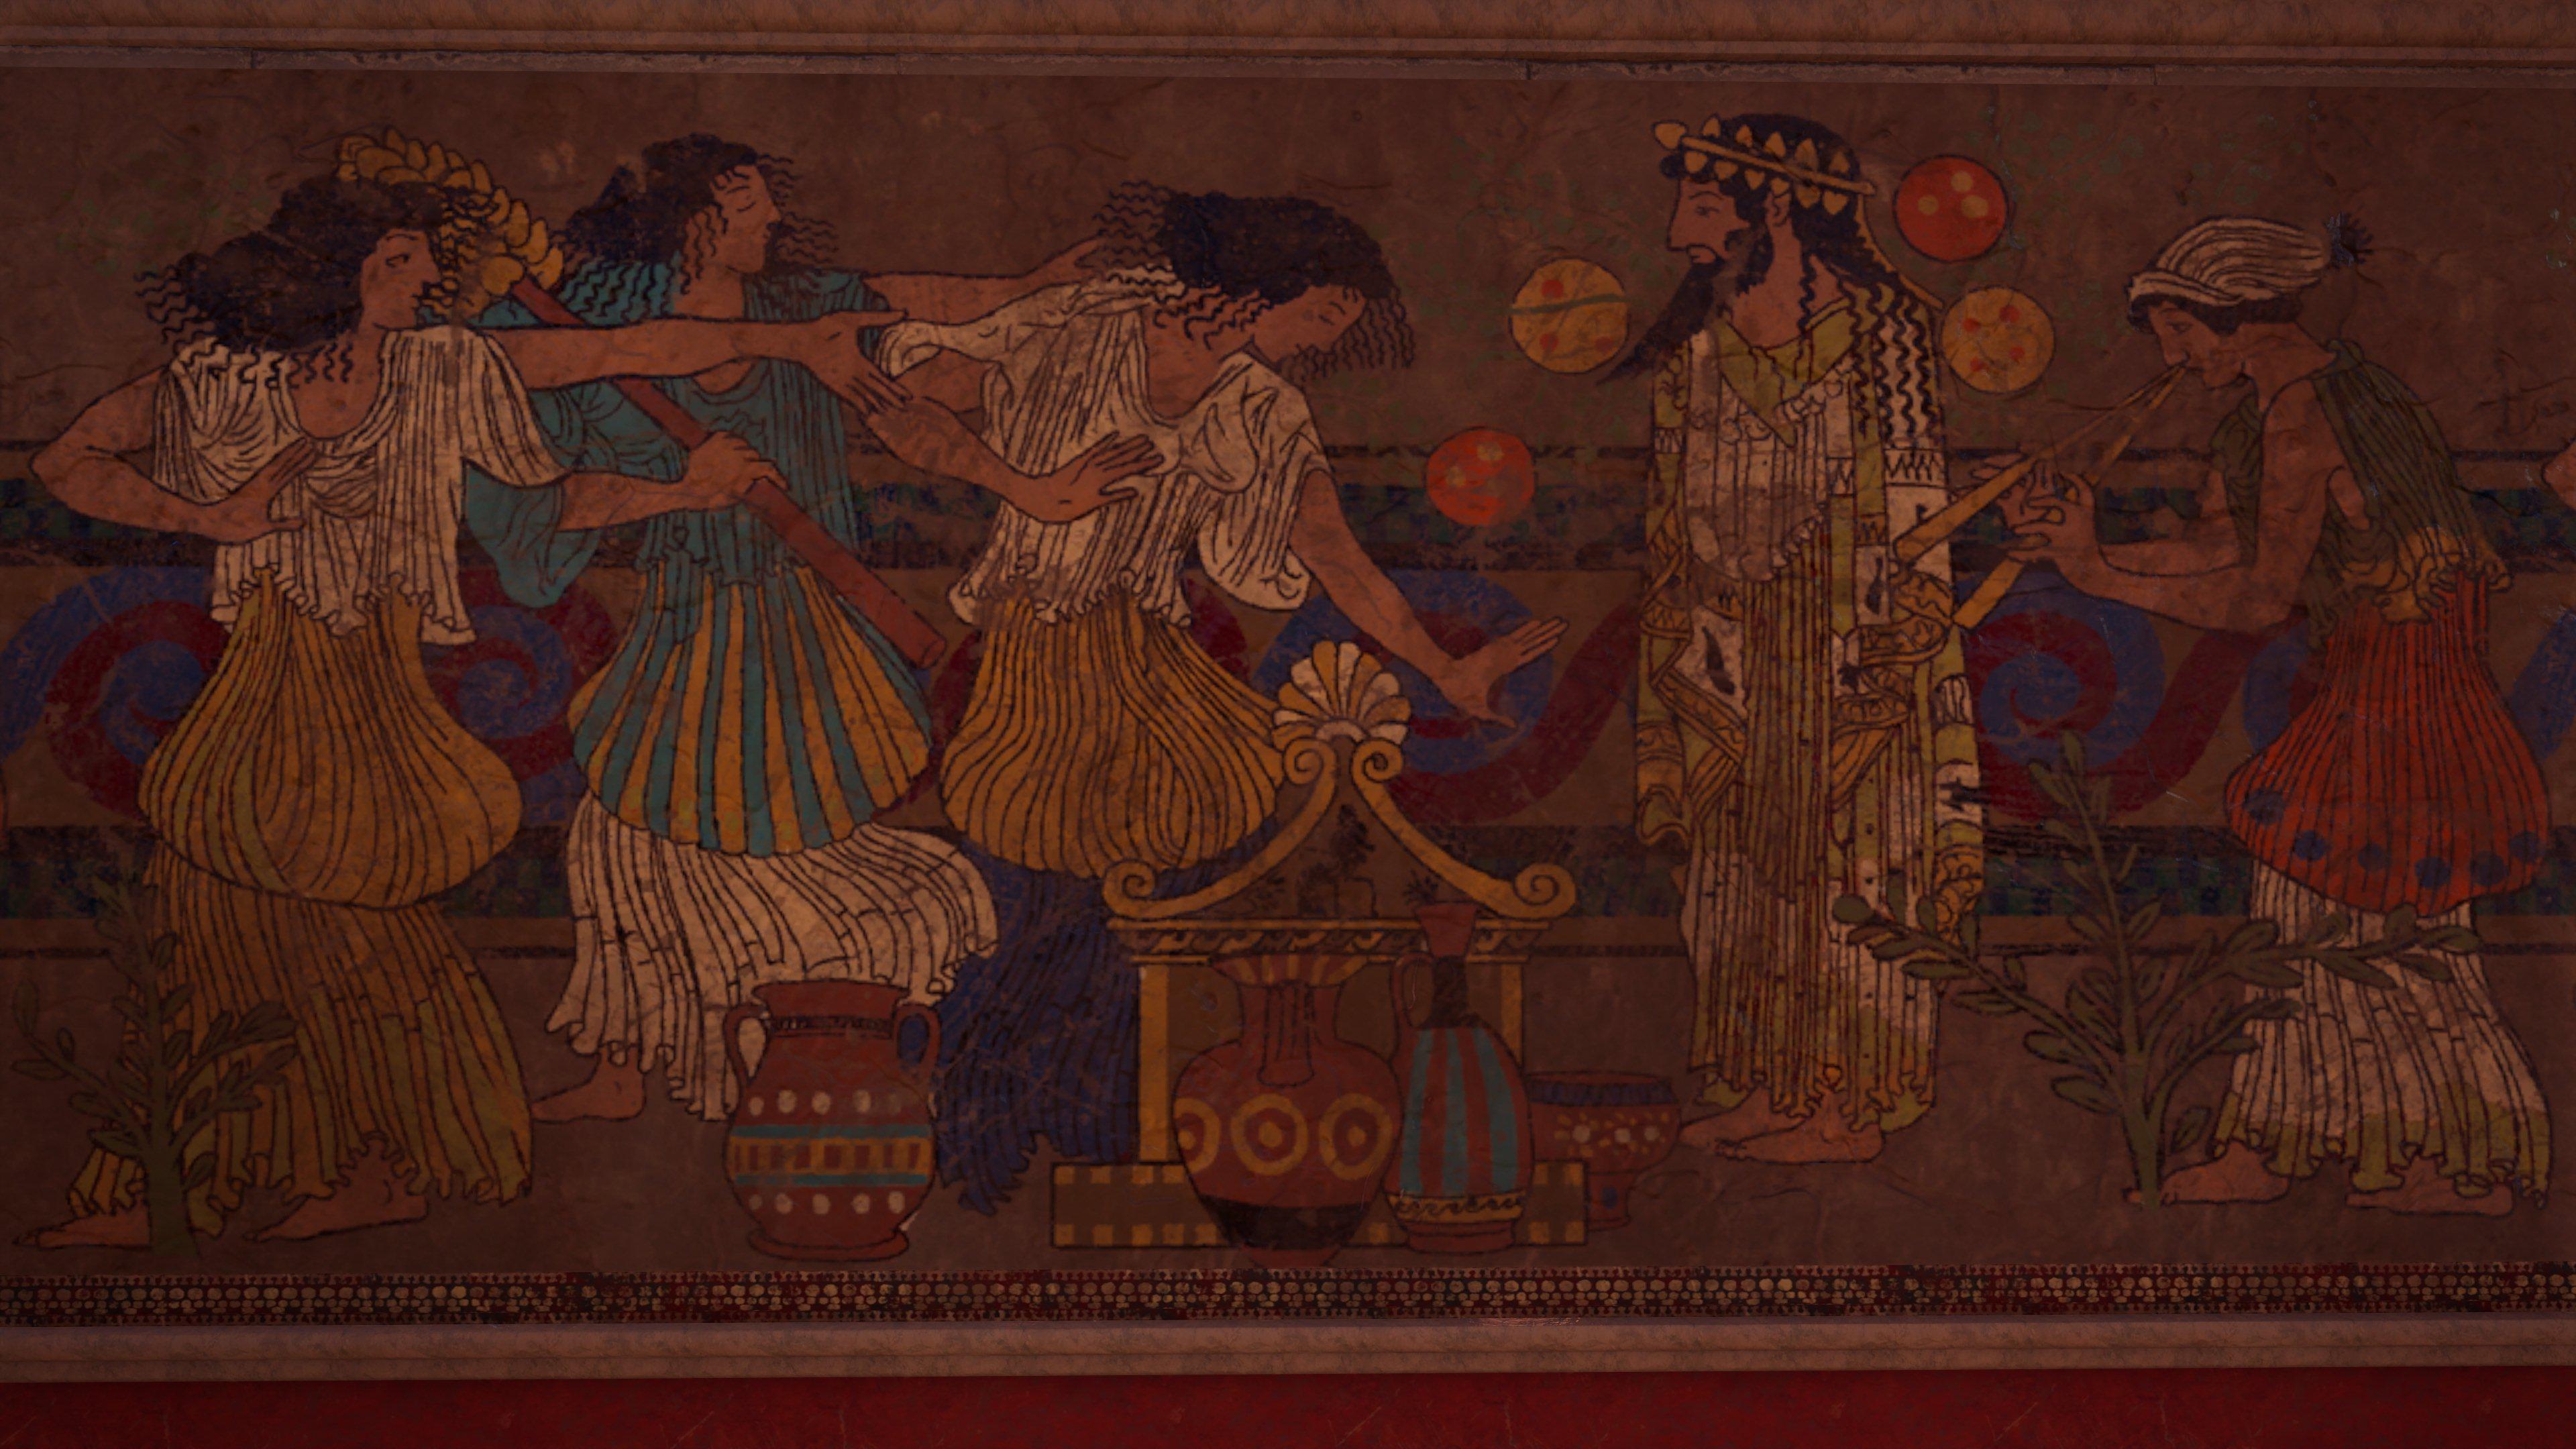 Cult of Dionysos